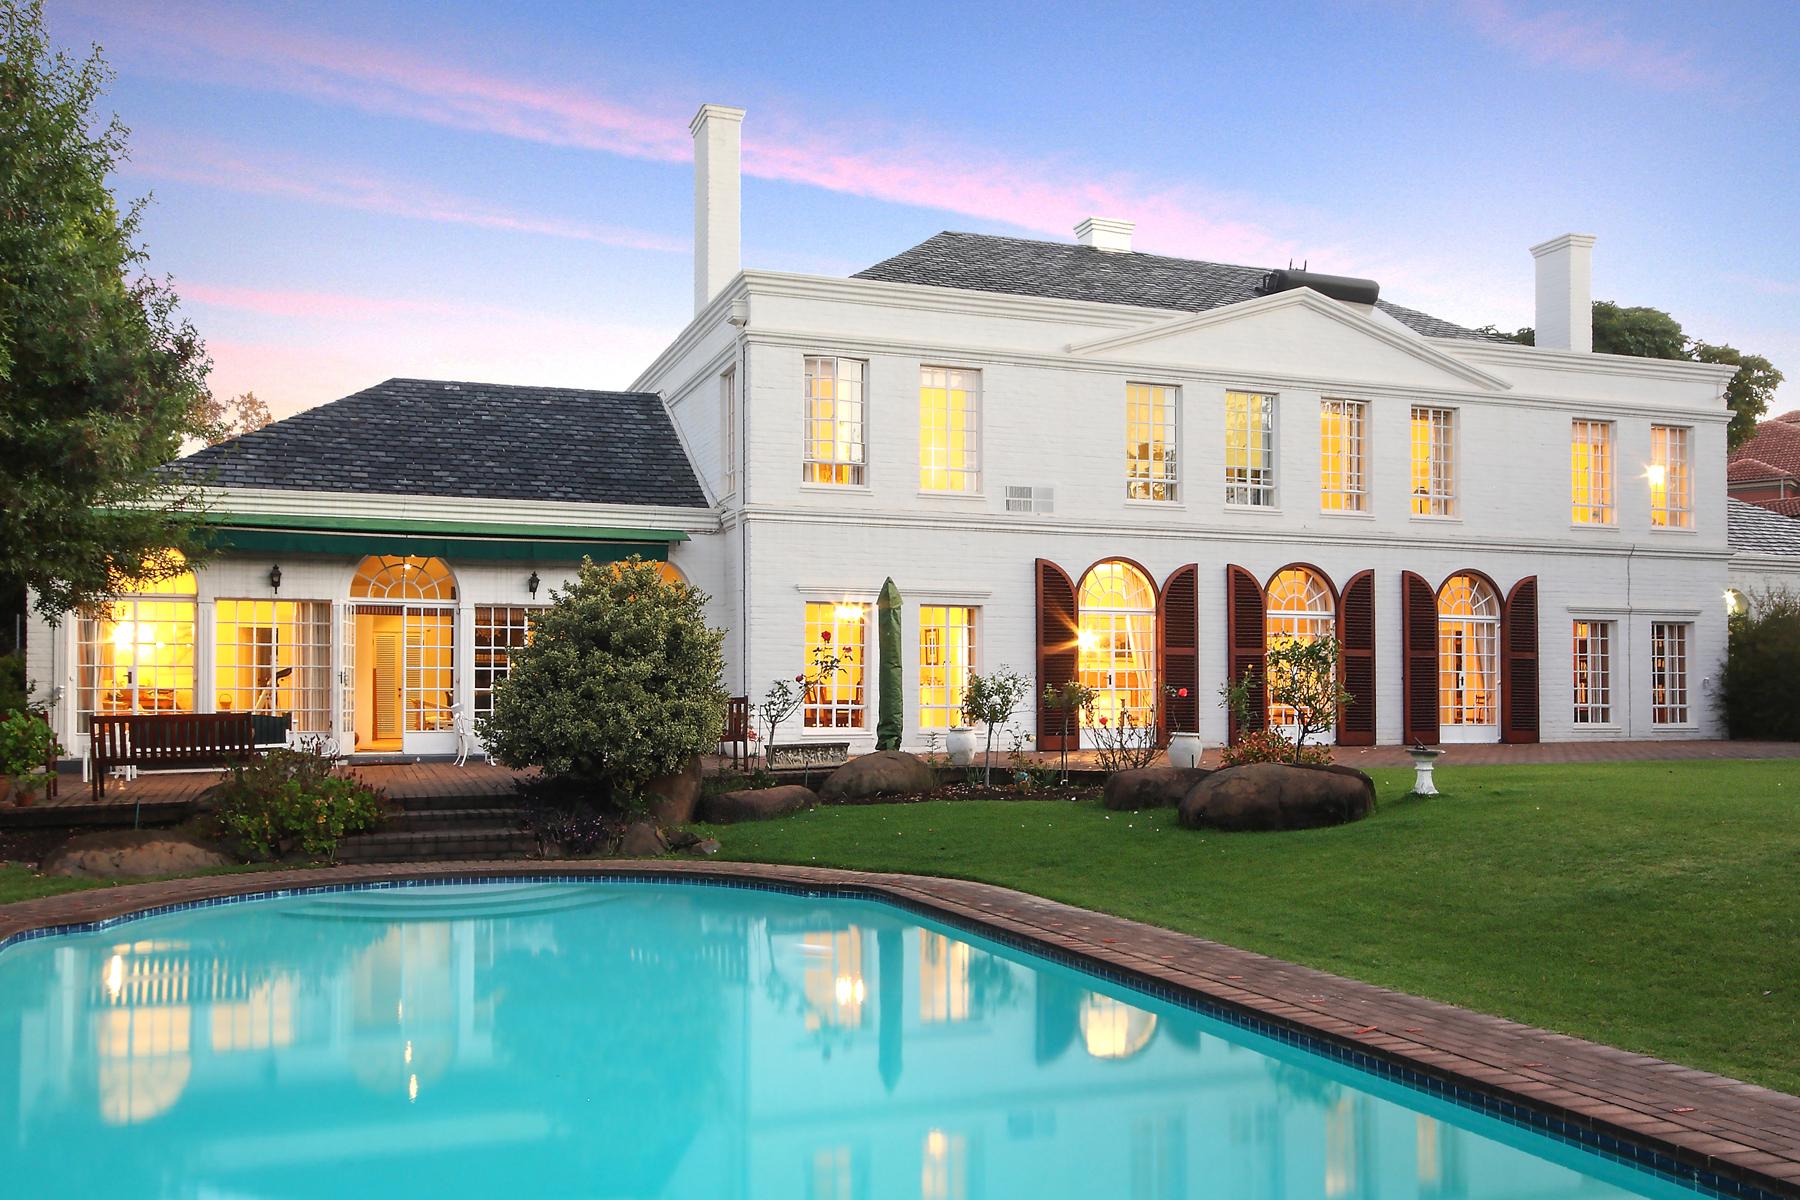 獨棟家庭住宅 為 出售 在 Morningside 12 Centre Road Johannesburg, 豪登省, 2057 南非